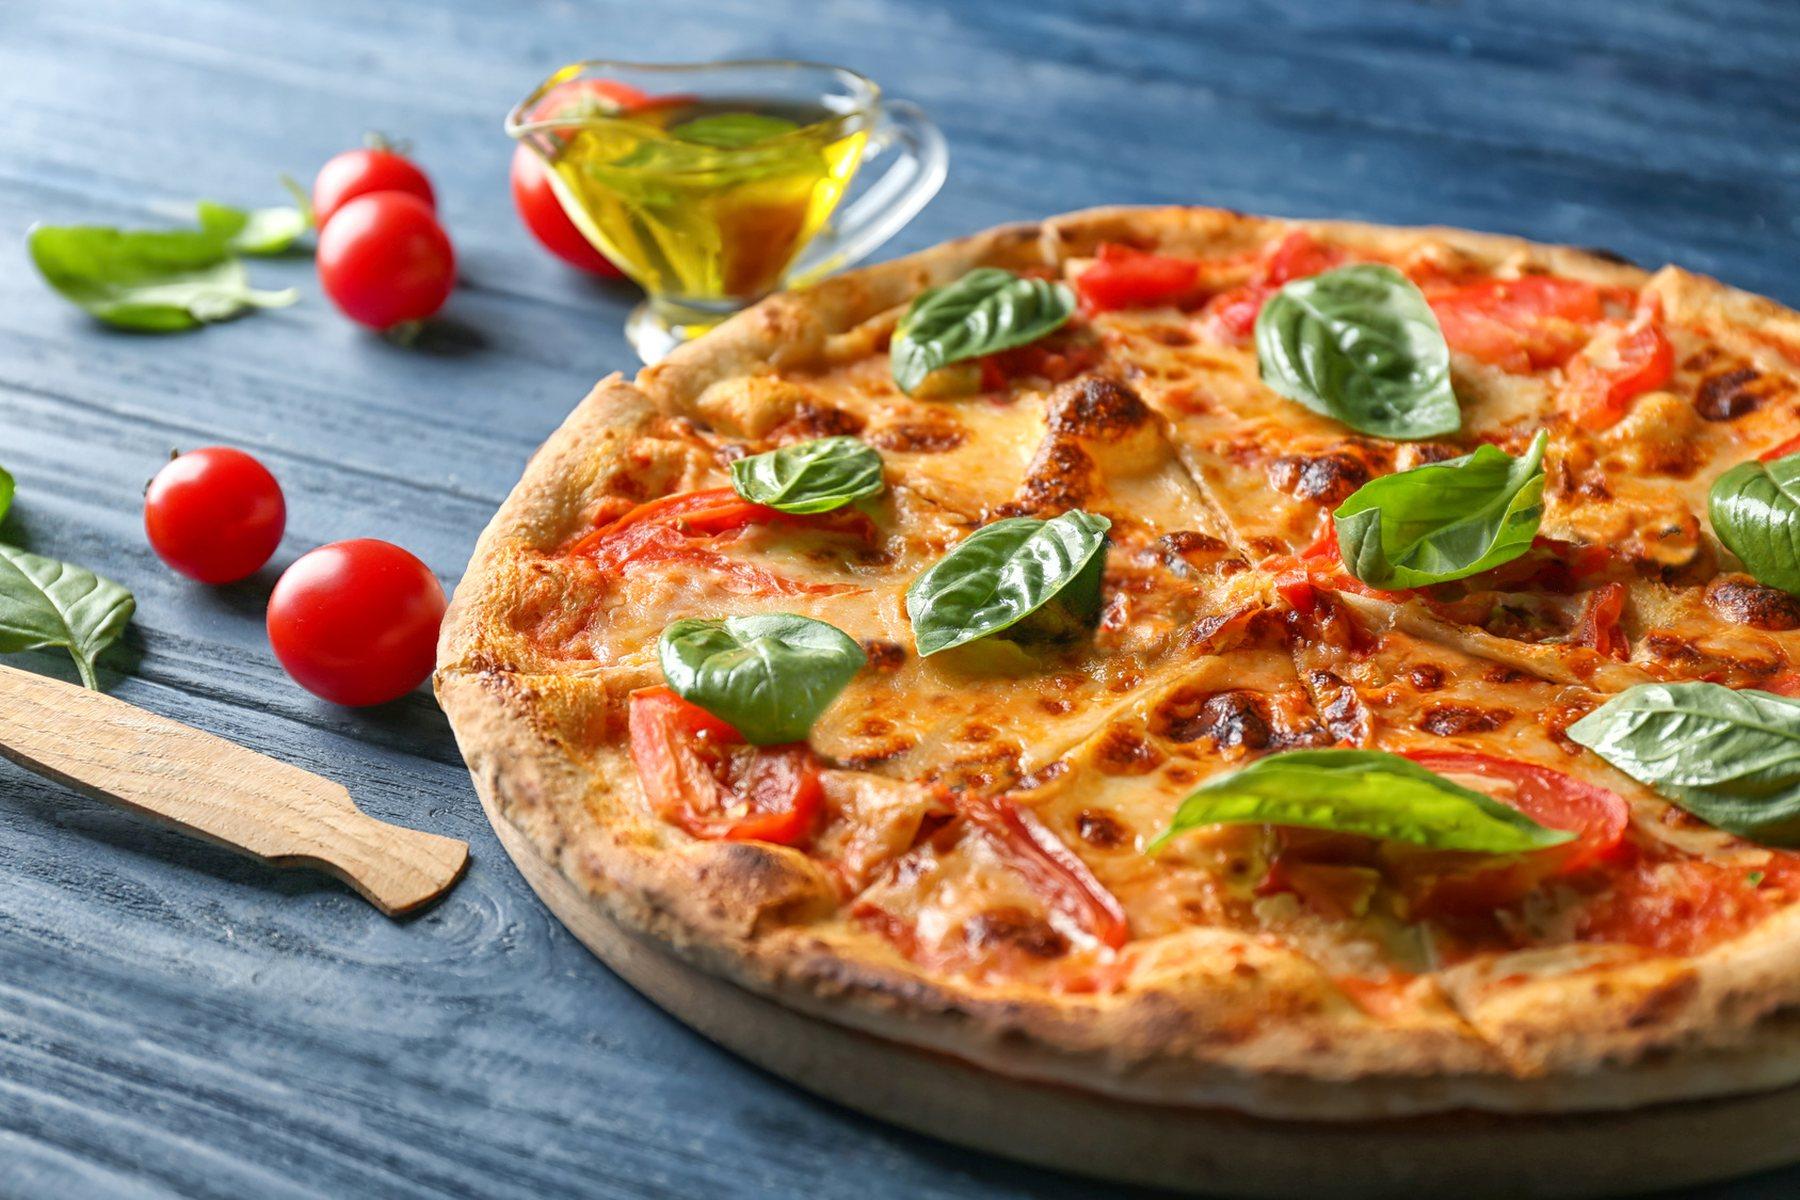 Trattoria Italia italienisch Restaurant Pizza Pasta Antipasti Jena